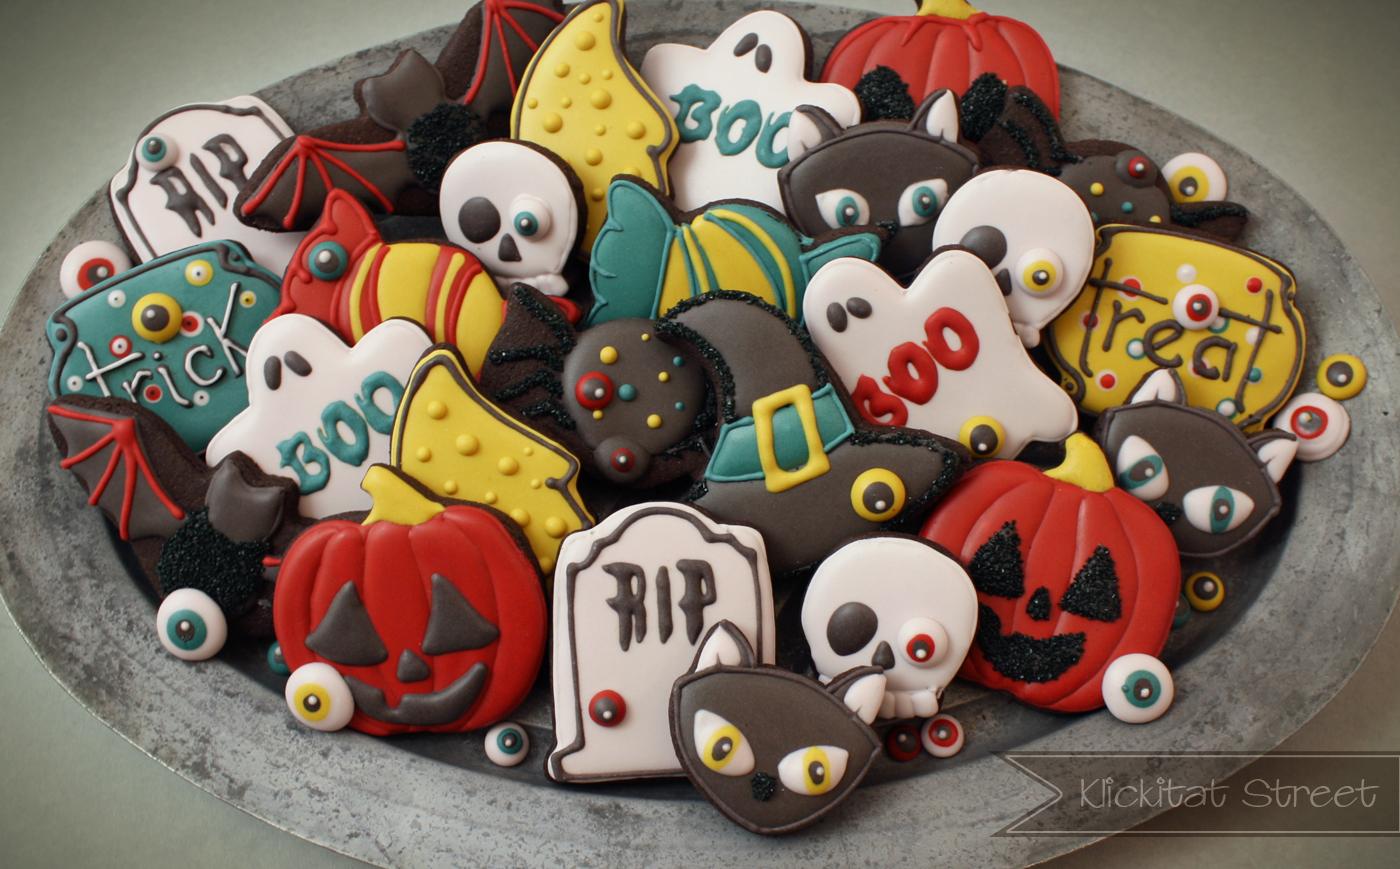 Halloween Color to Die For | Klickitat Street